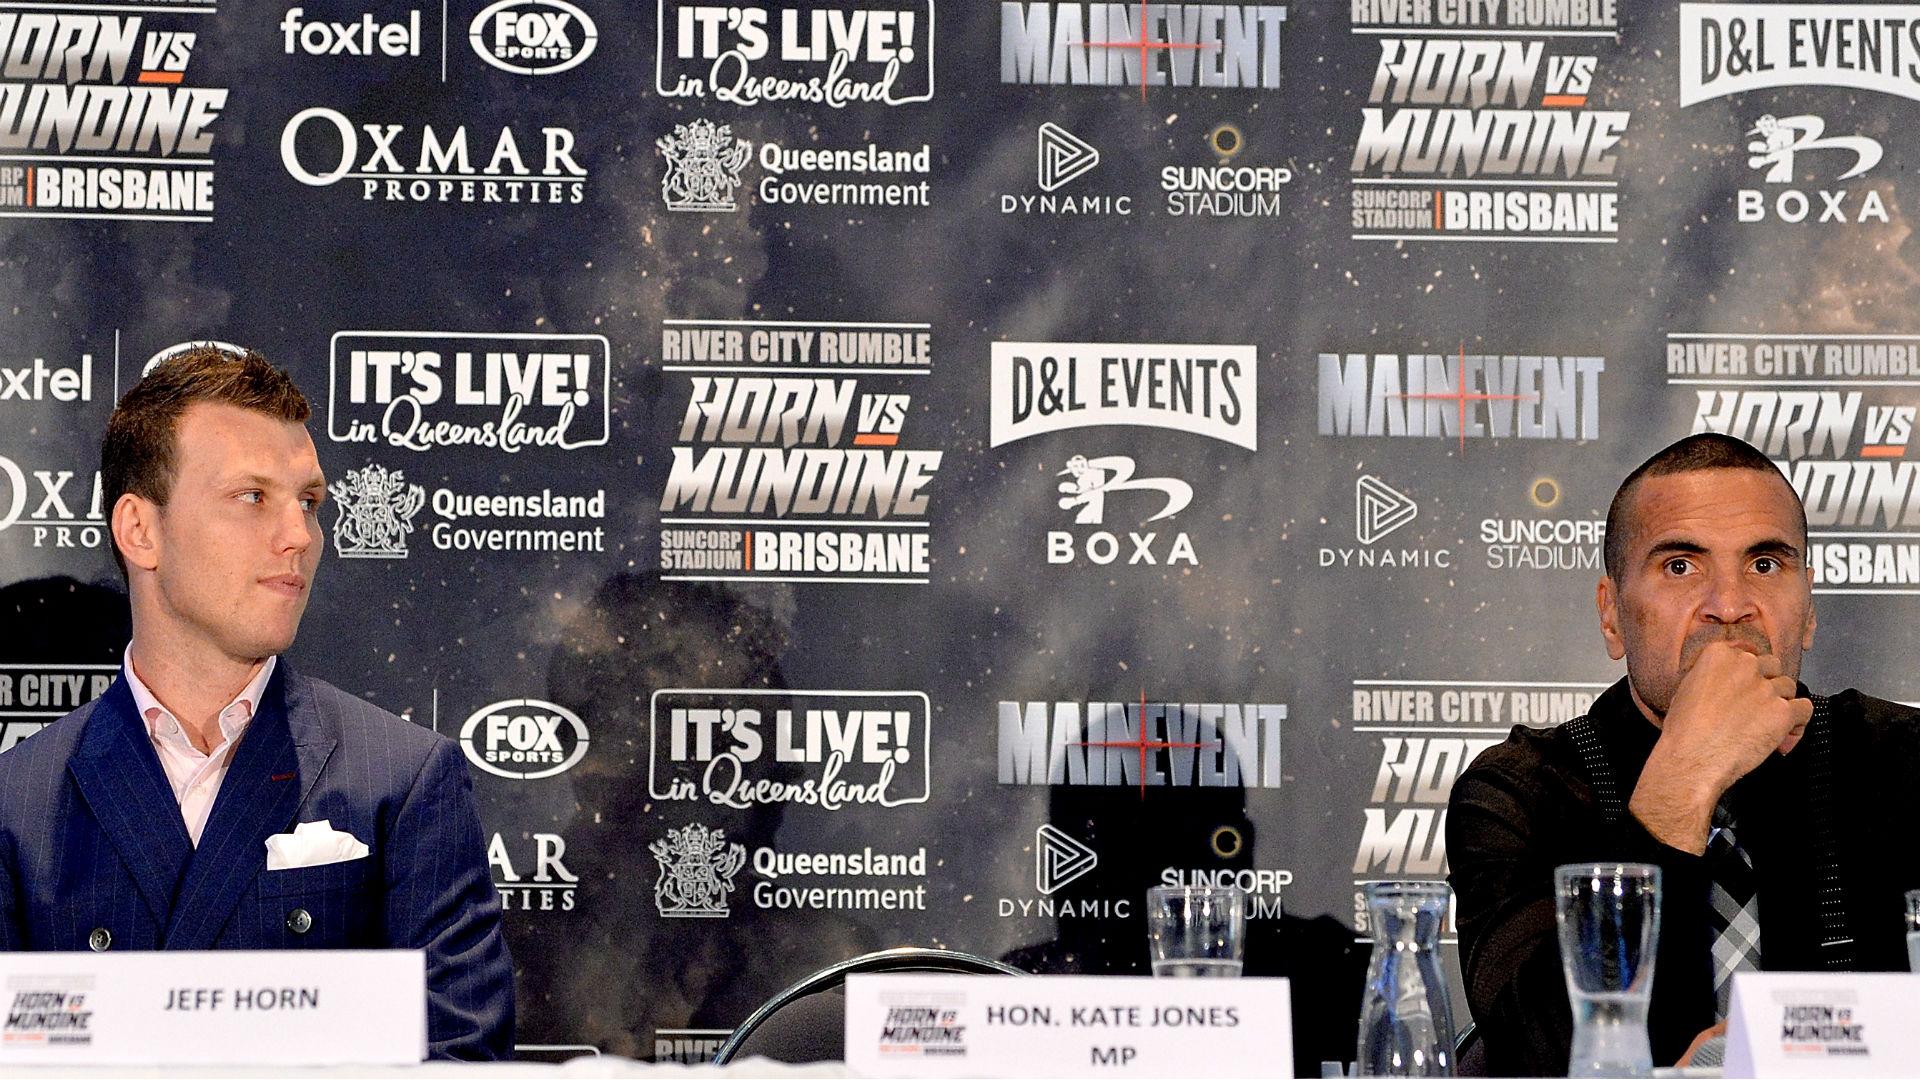 Jeff Horn vs Anthony Mundine: Team Horn responds to Mundine's national anthem protest